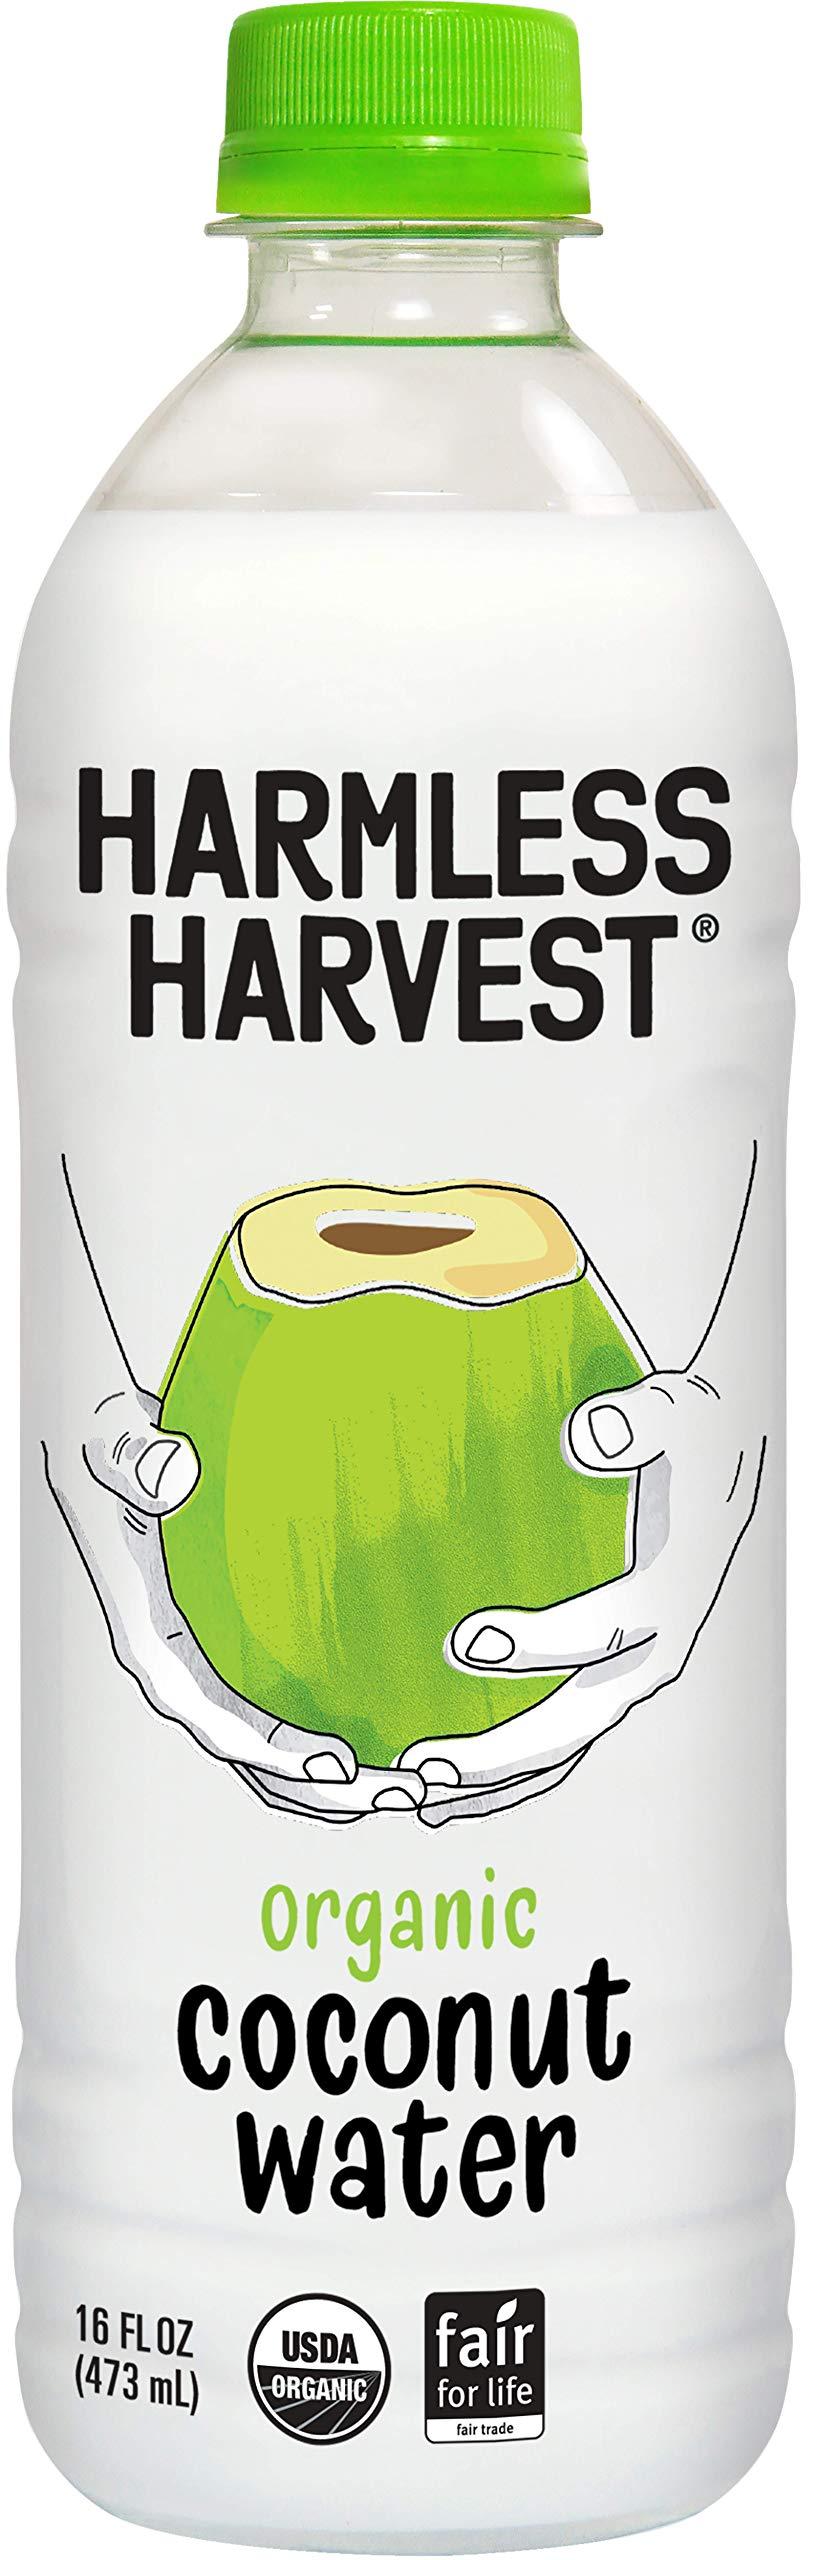 Harmless Harvest Organic Coconut Water, Original 16 Fl Oz, Pack of 12